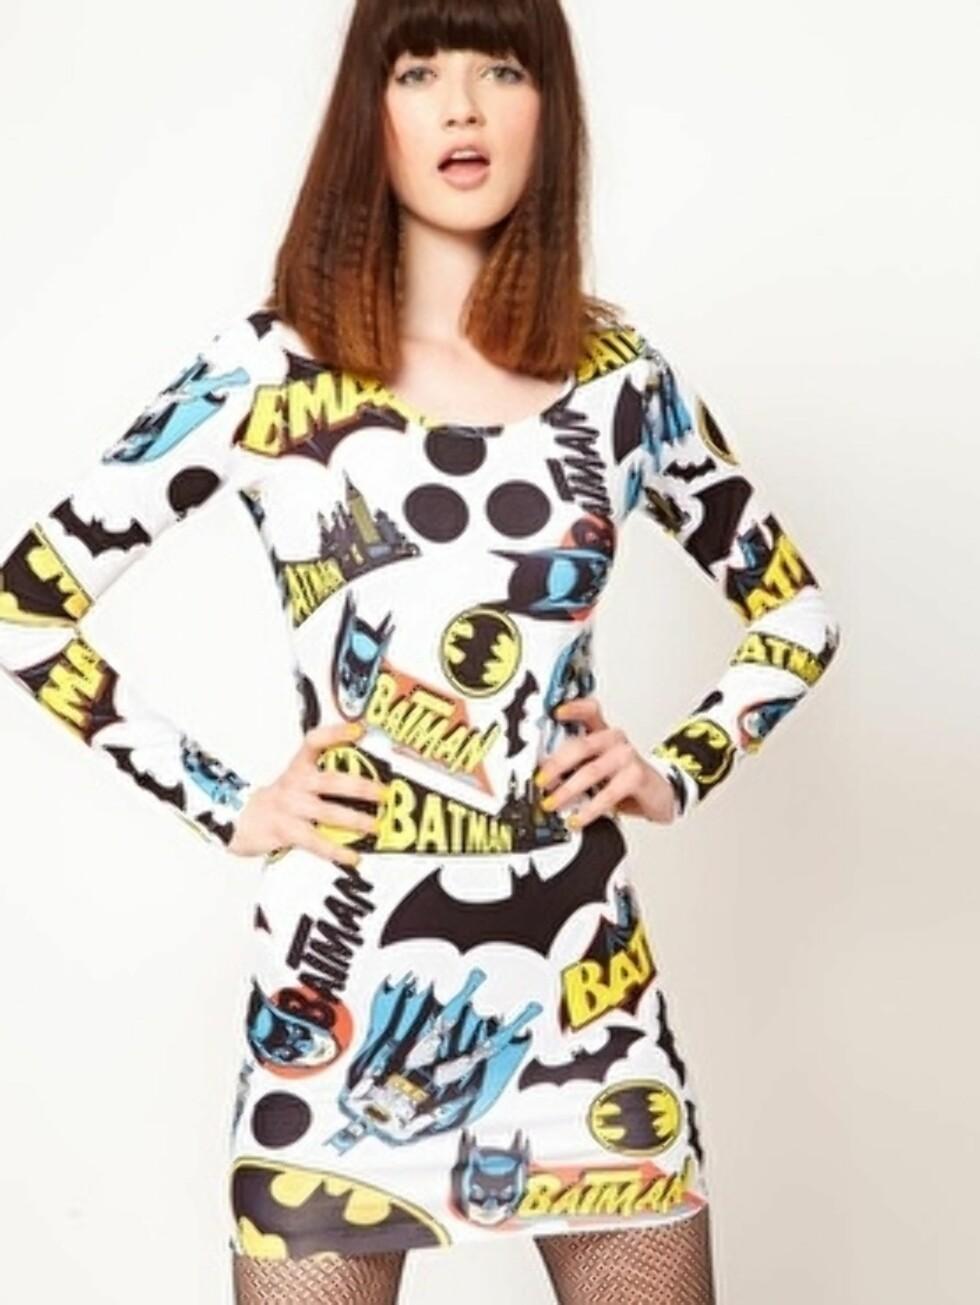 Batman-kjole (kr 625, Asos.com). Foto: Produsenten